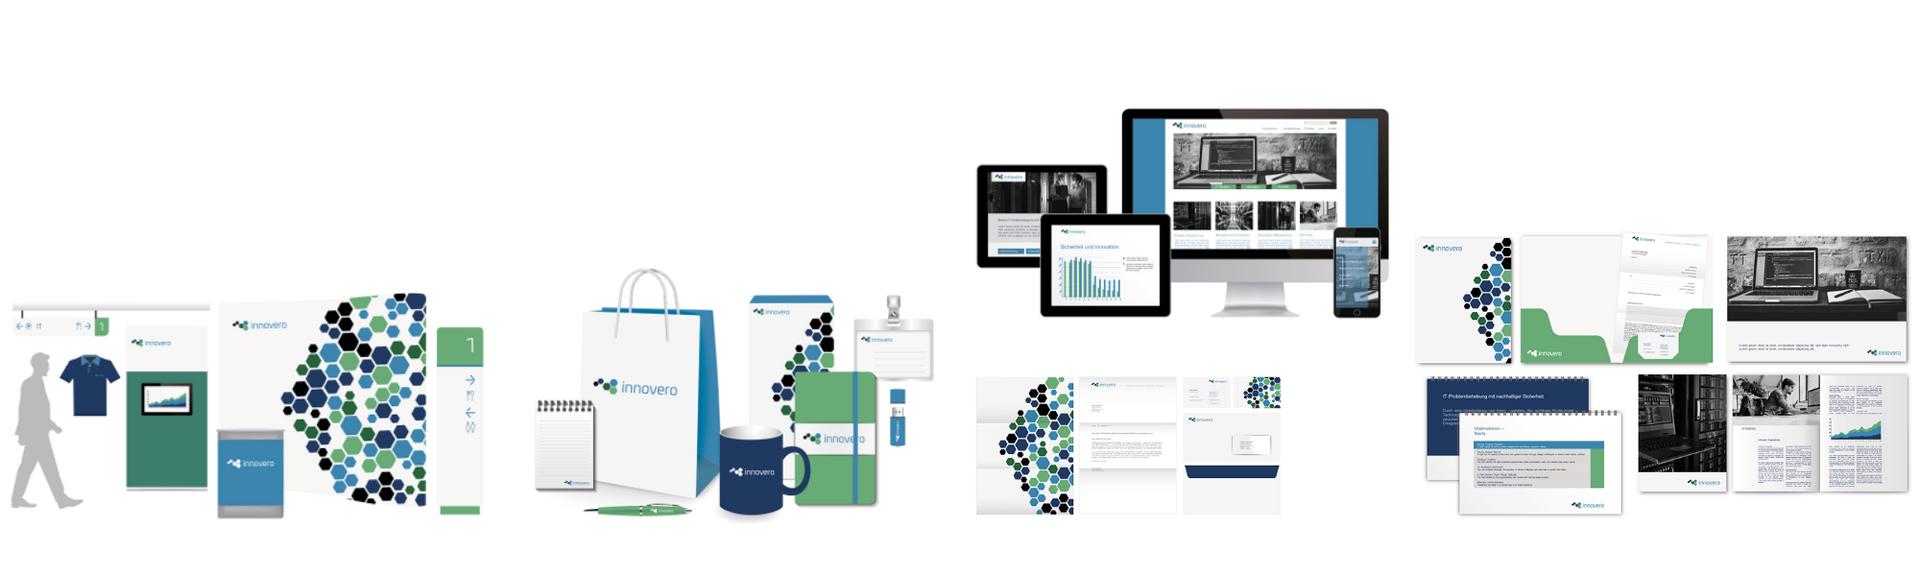 Corporate Design Lösung für Digital & Technik